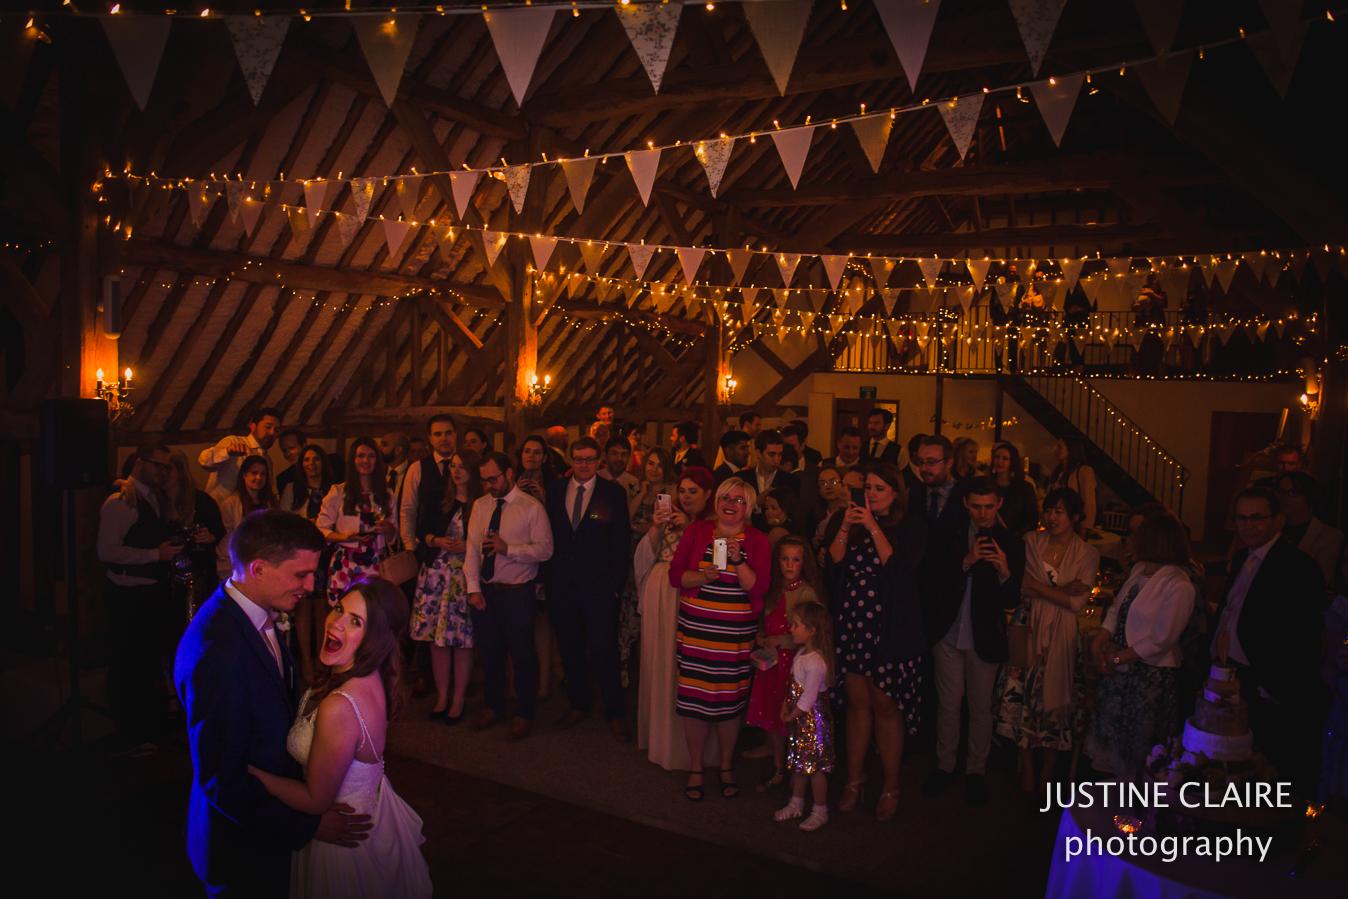 Fitzleroi Fittleworth petworth Billingshurst farm Wedding Photography by Justine Claire photographer Arundel Worthing Brighton-78.jpg